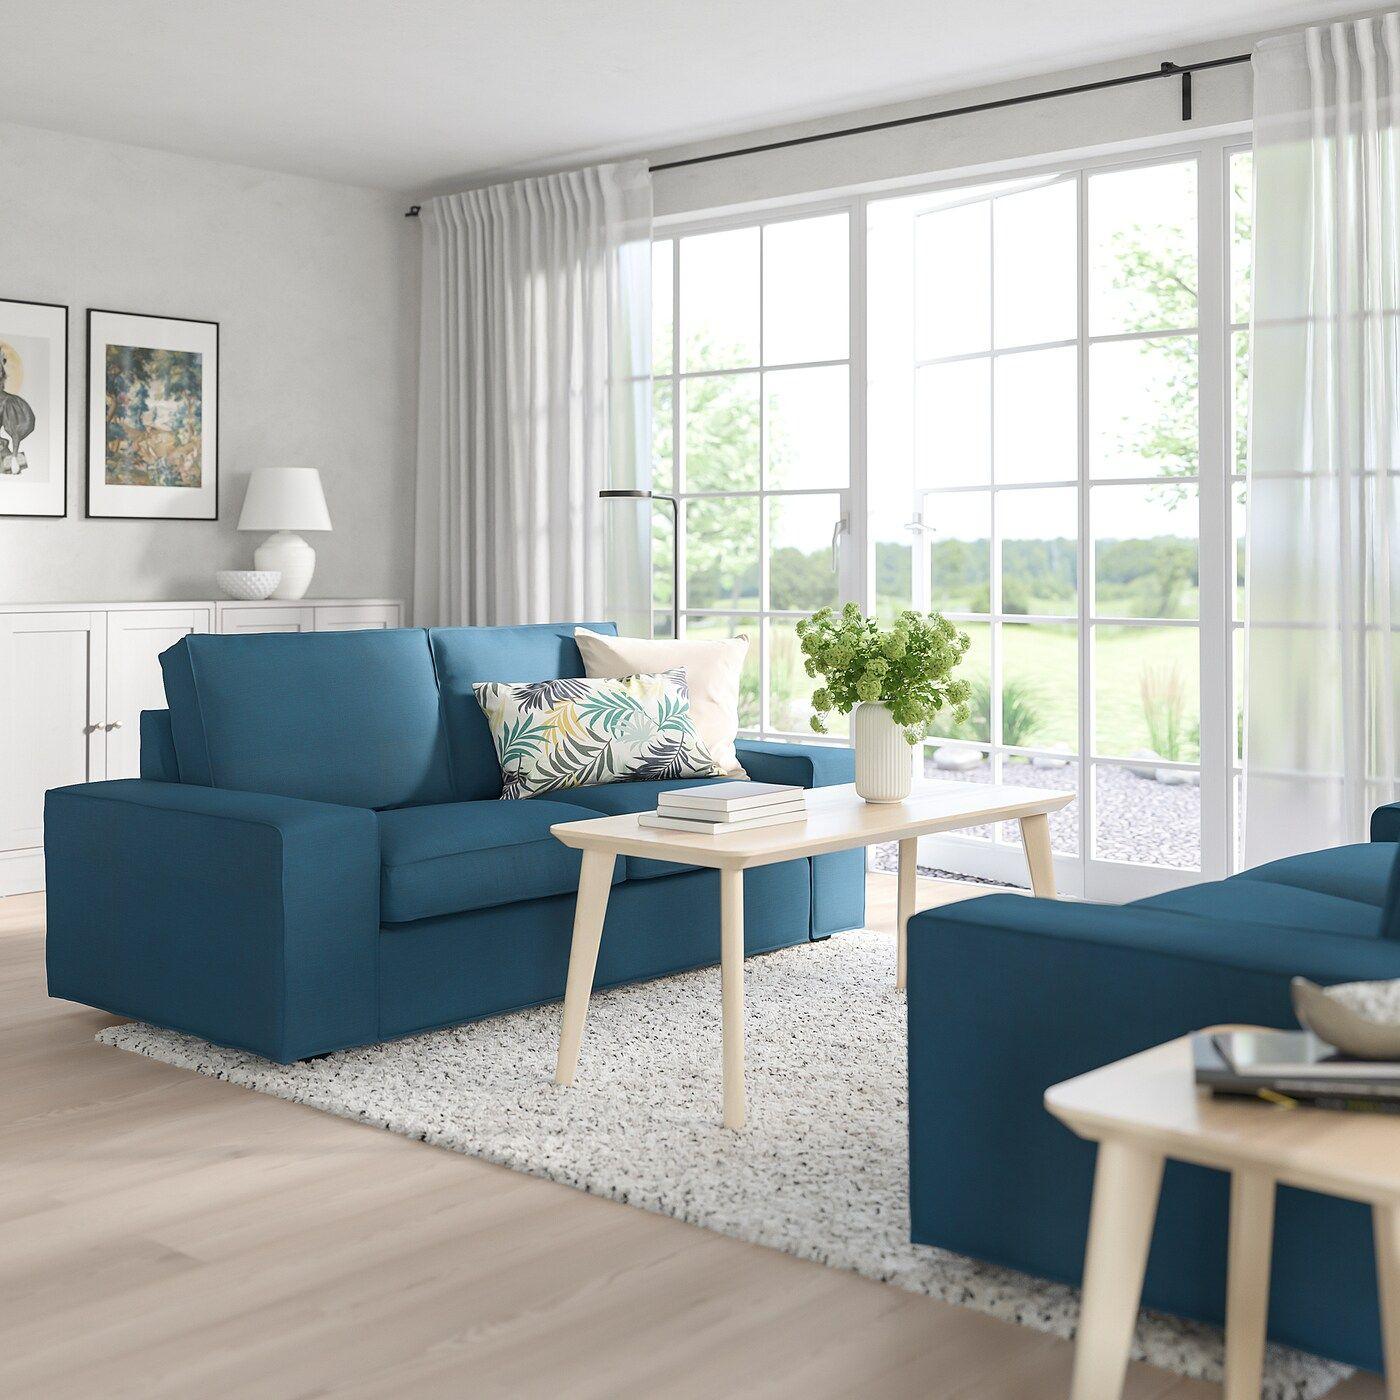 Kivik 2er Sofa Hillared Dunkelblau Ikea Osterreich In 2020 2er Sofa Kleines Sofa Und Sofa